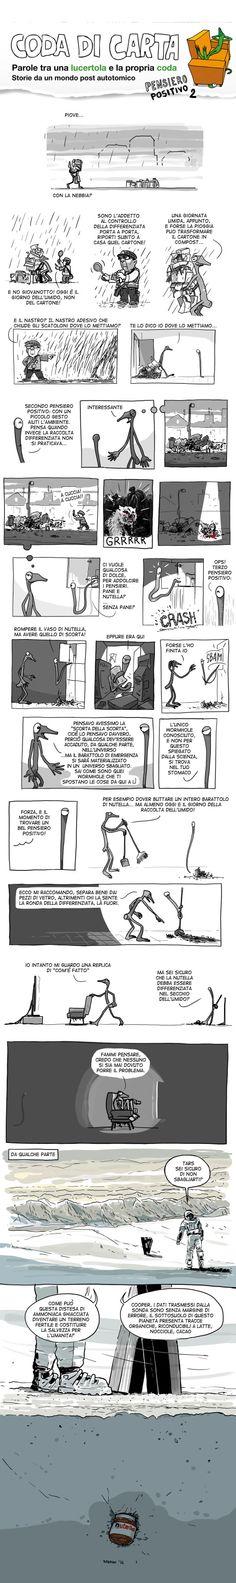 pensiero +2